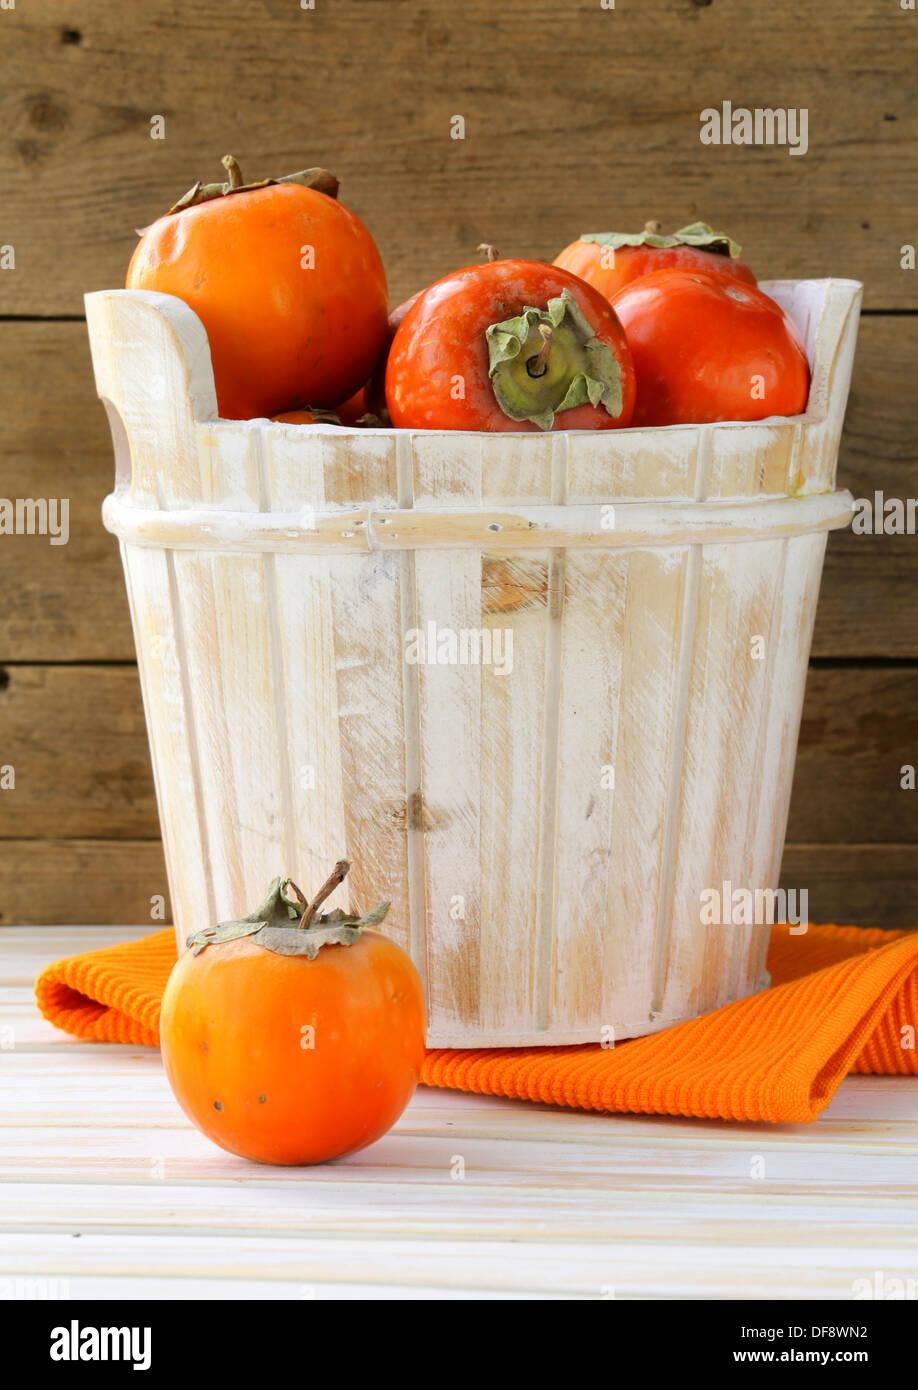 Orange ripe persimmon in a wooden bucket - Stock Image